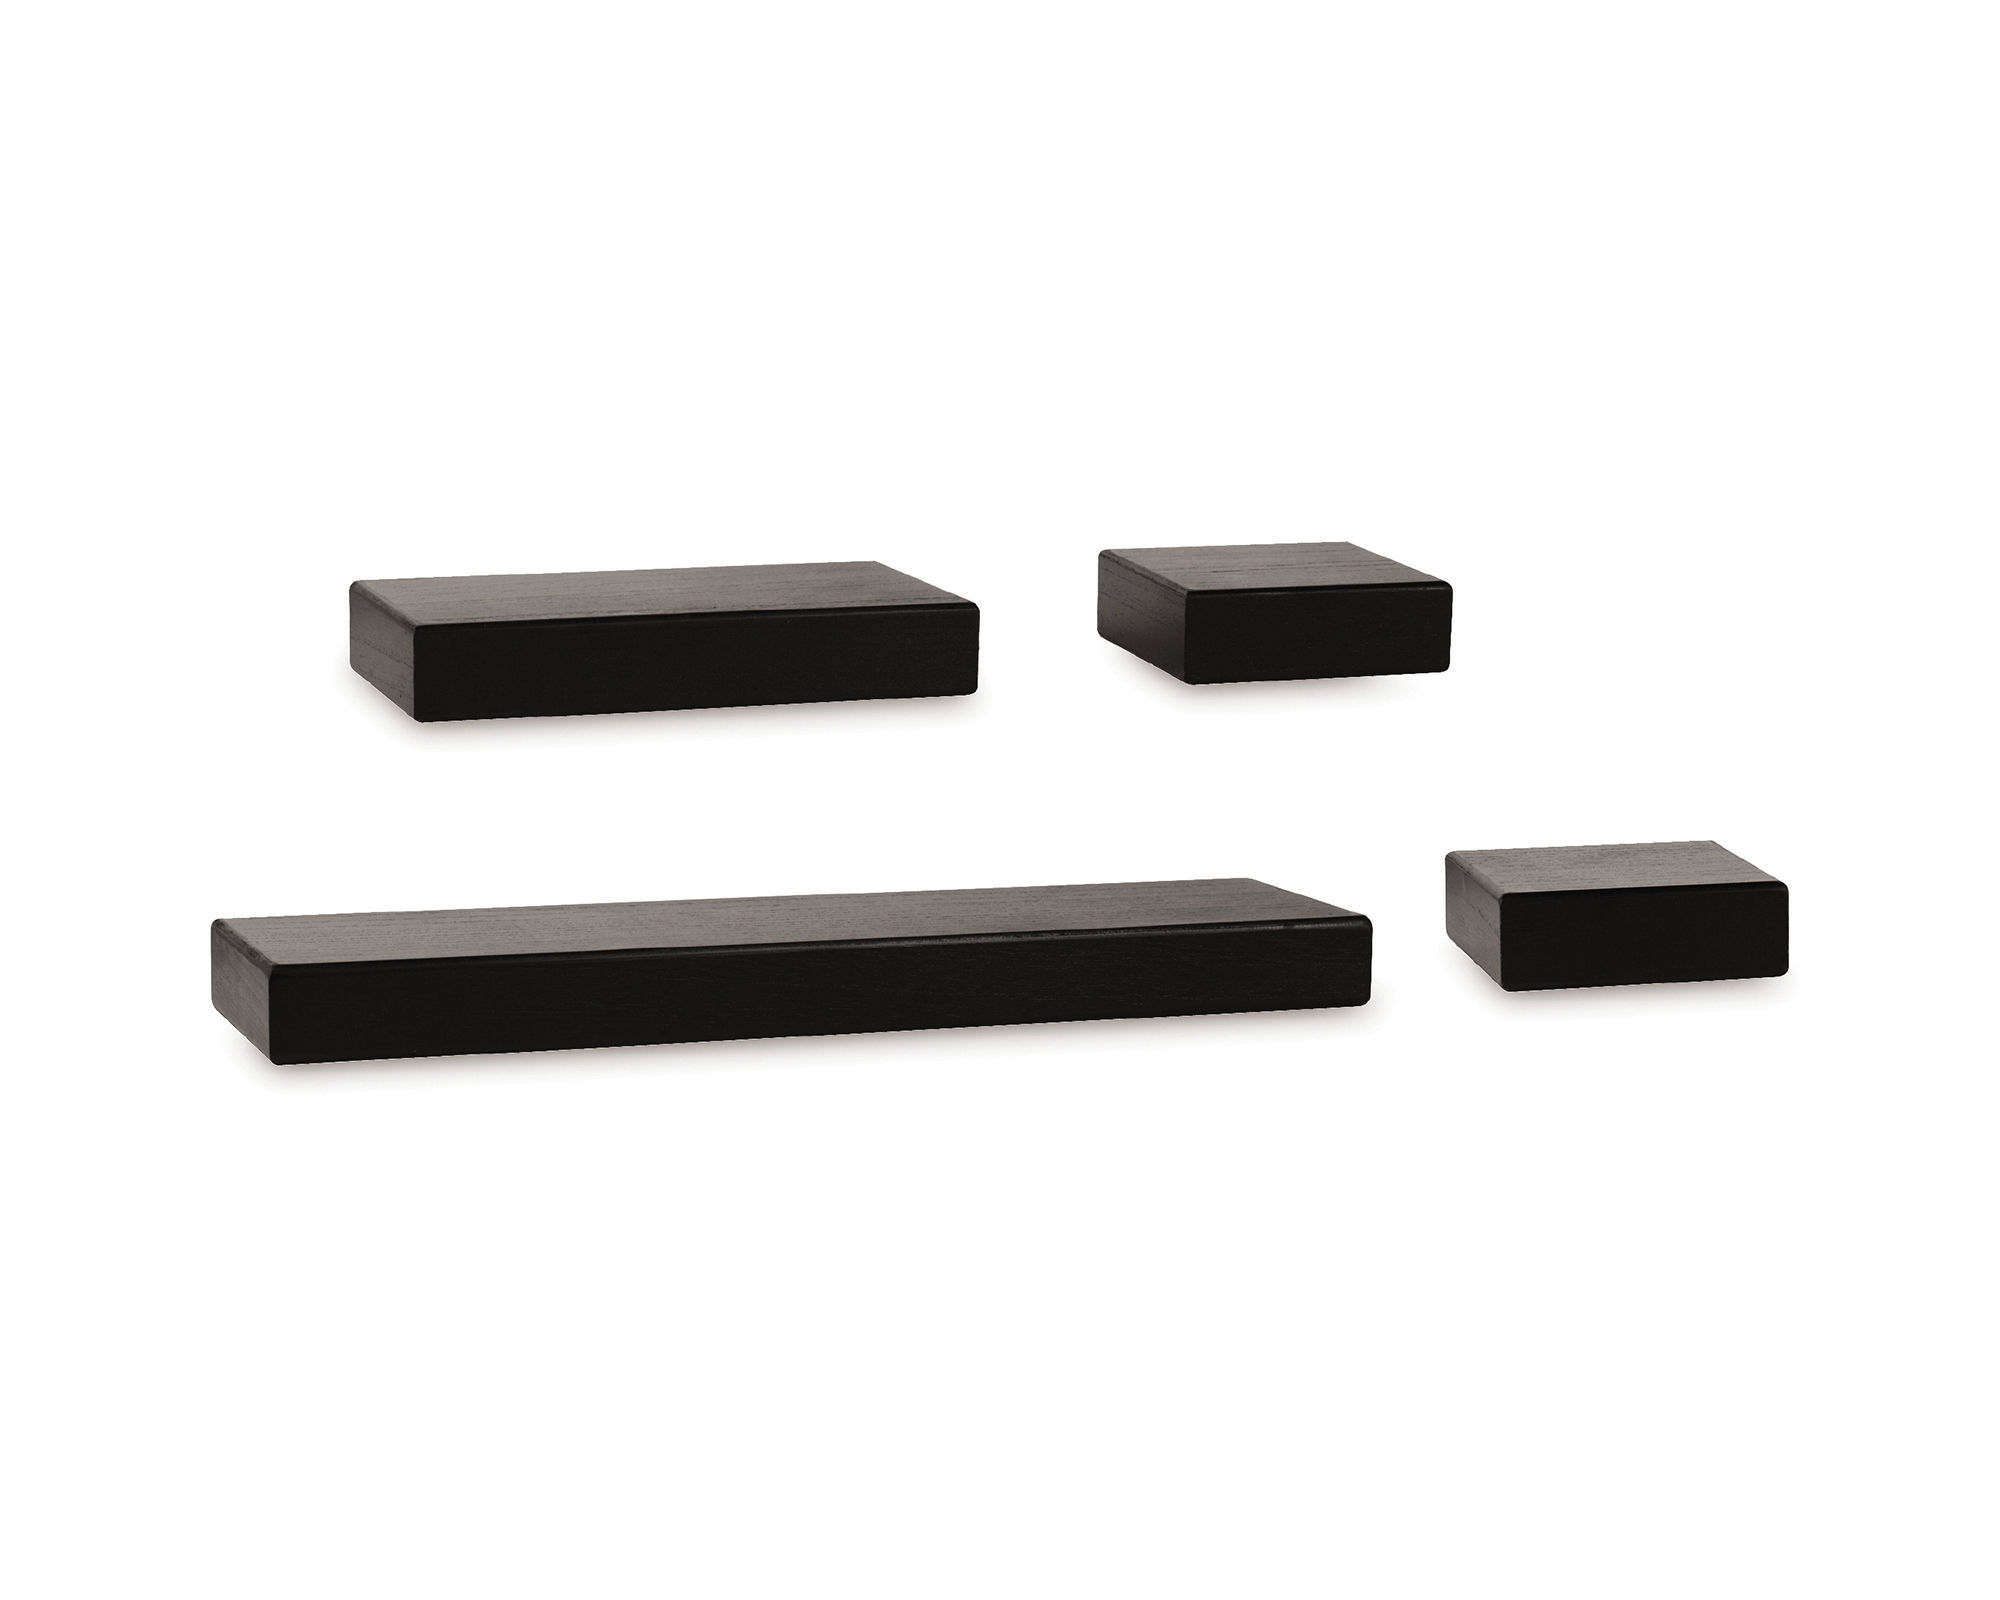 Melannco 4-pc. Floating Shelf Set